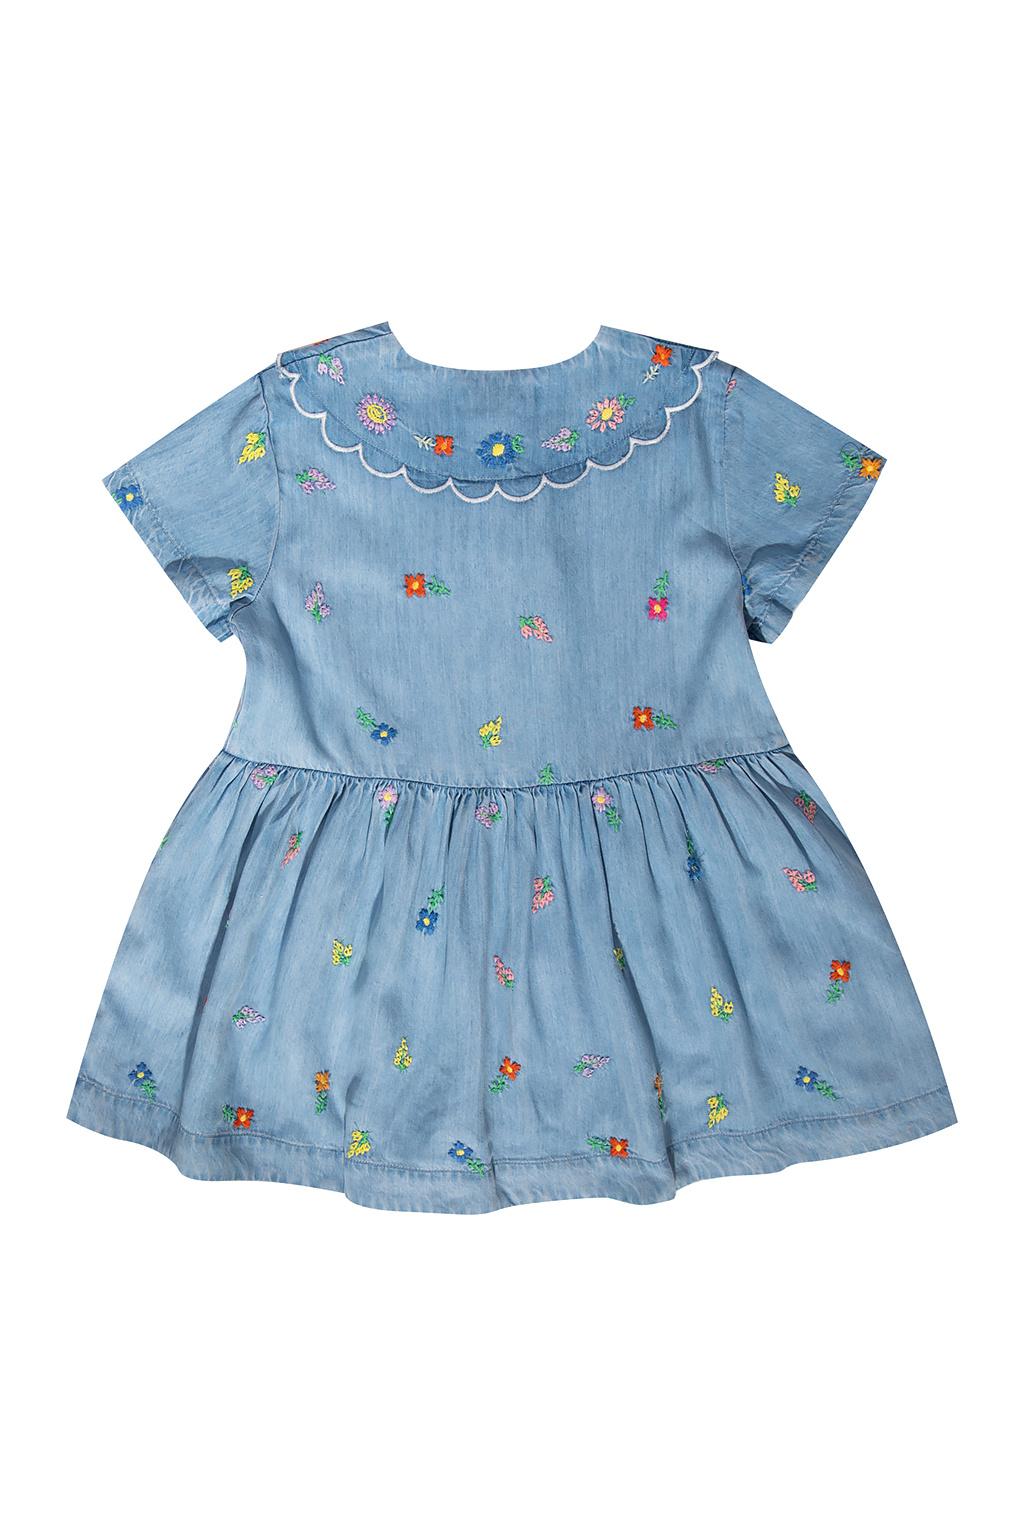 Stella McCartney Kids Denim dress